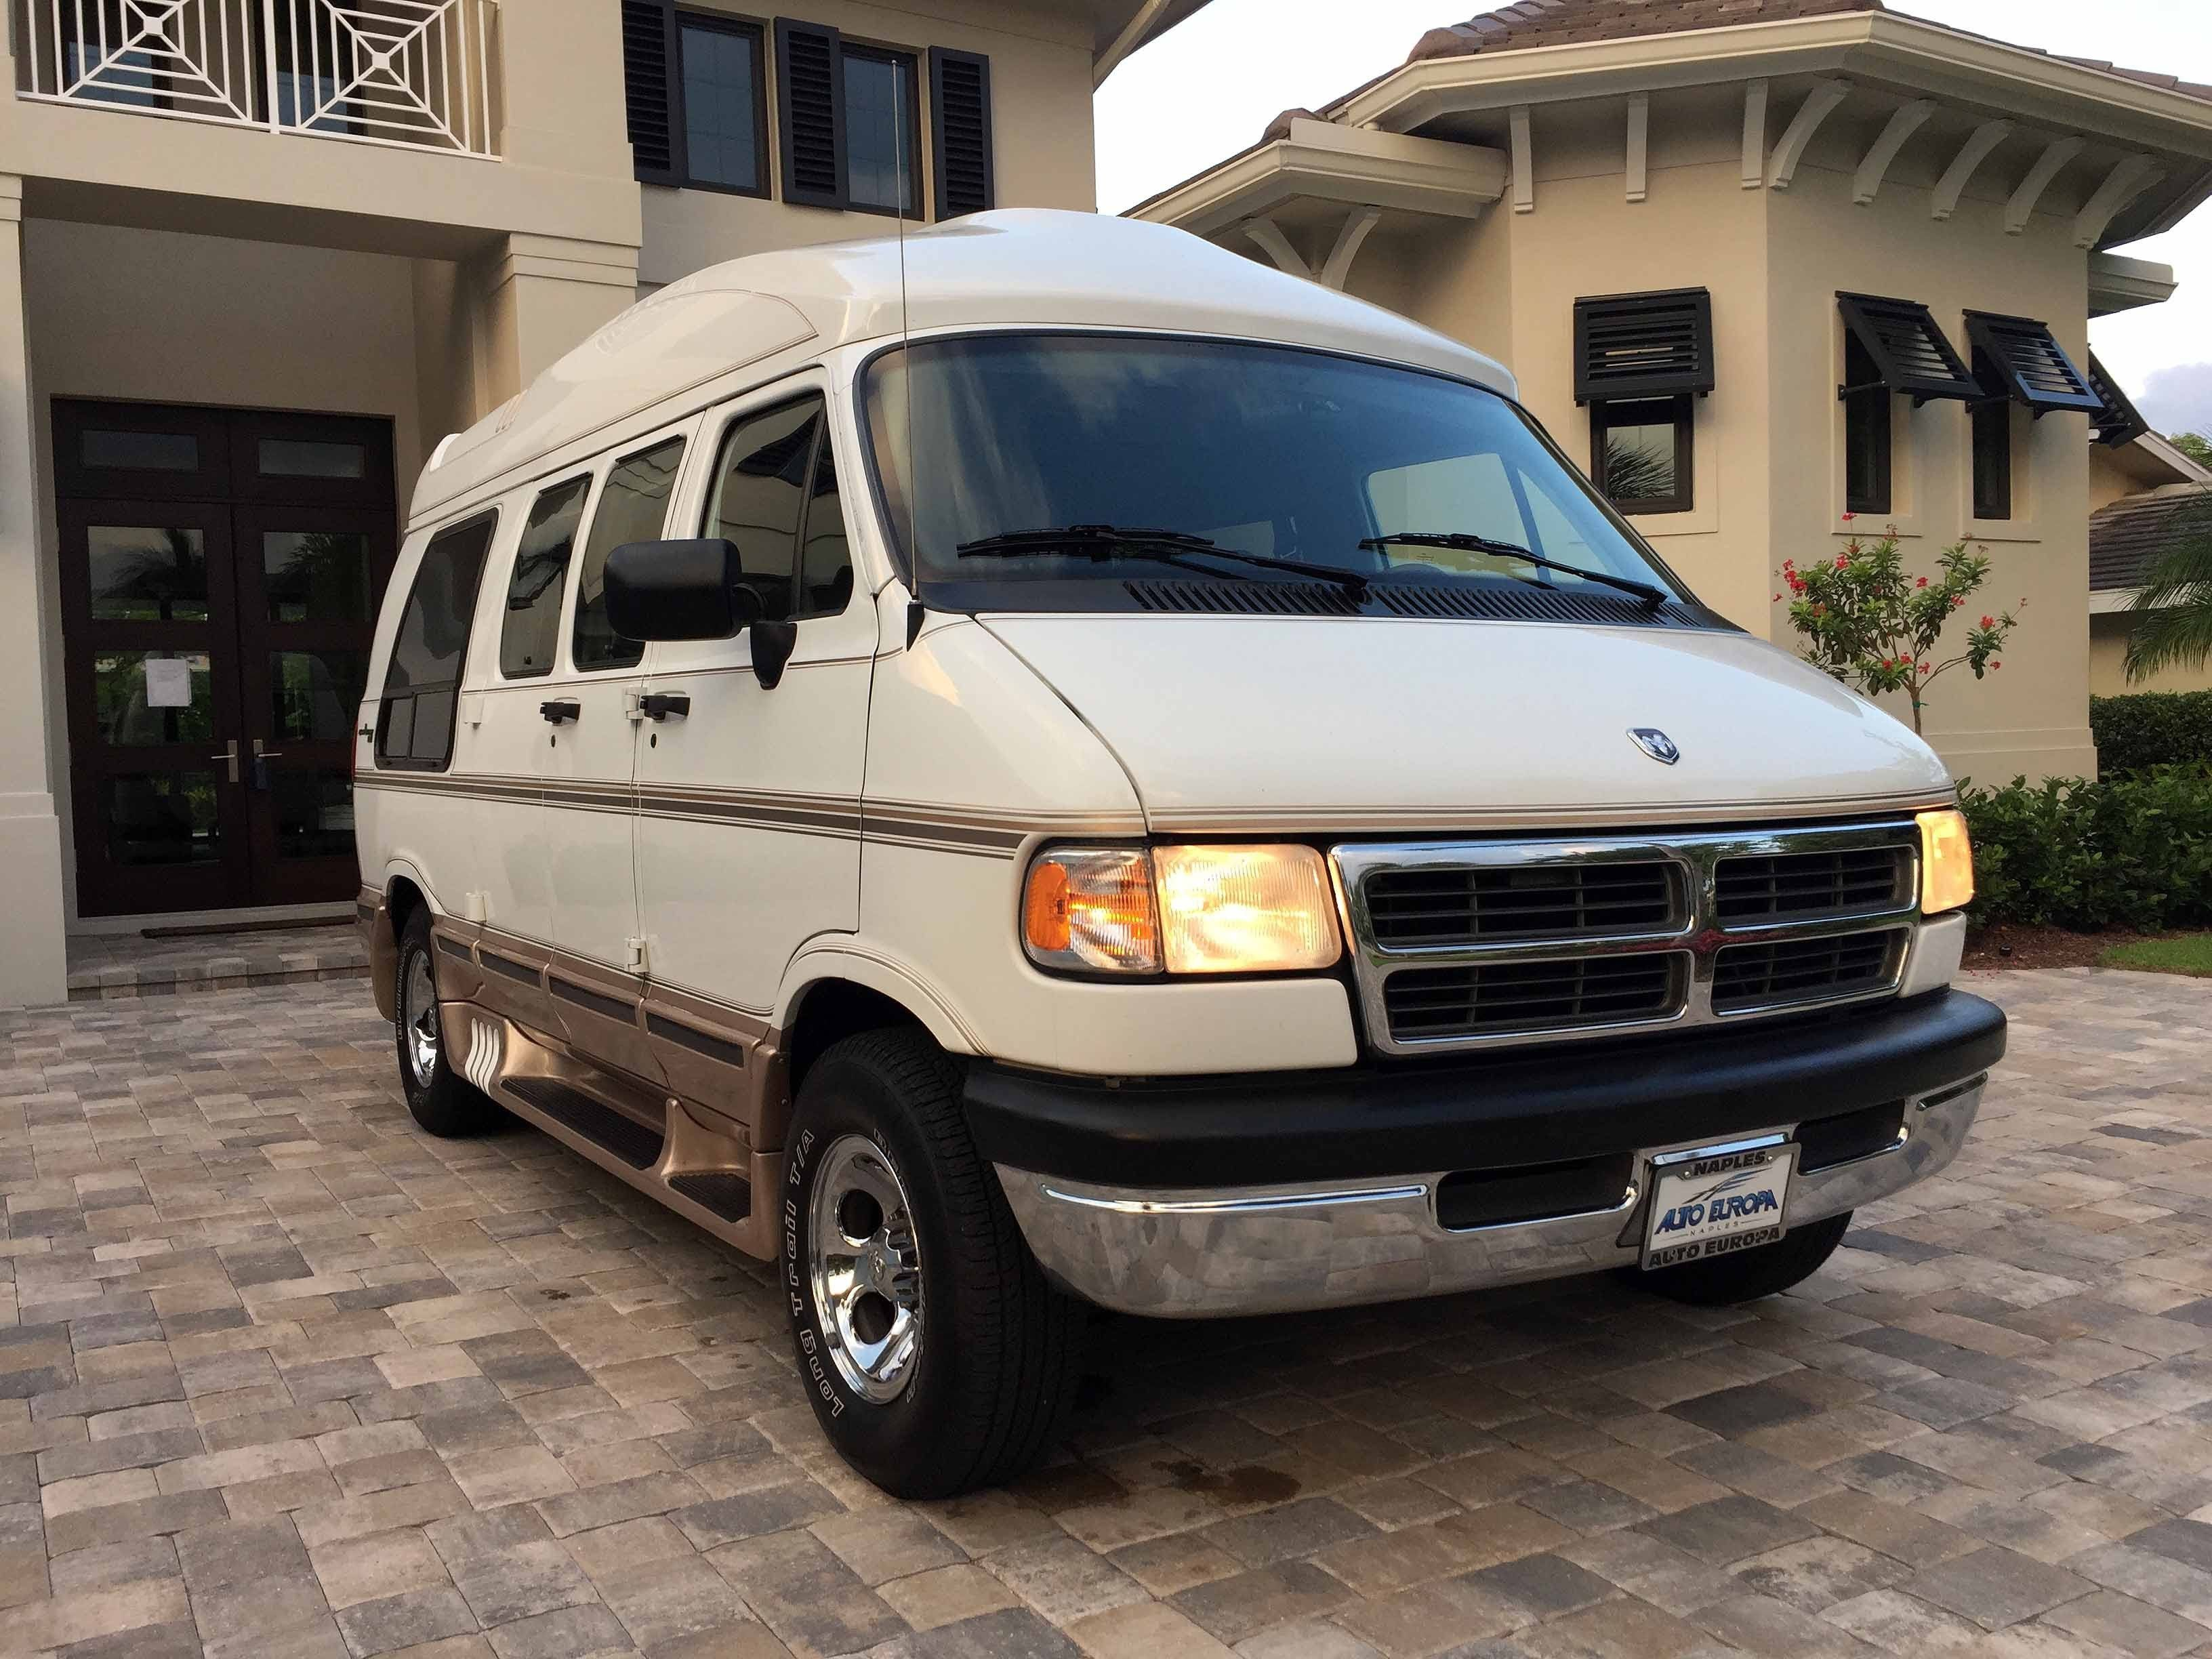 Latest dodge ram dodge ram chrystar premium conversion van for sale by auto europa naples mercedesexpert com 87509 santa fe nm aug 2018